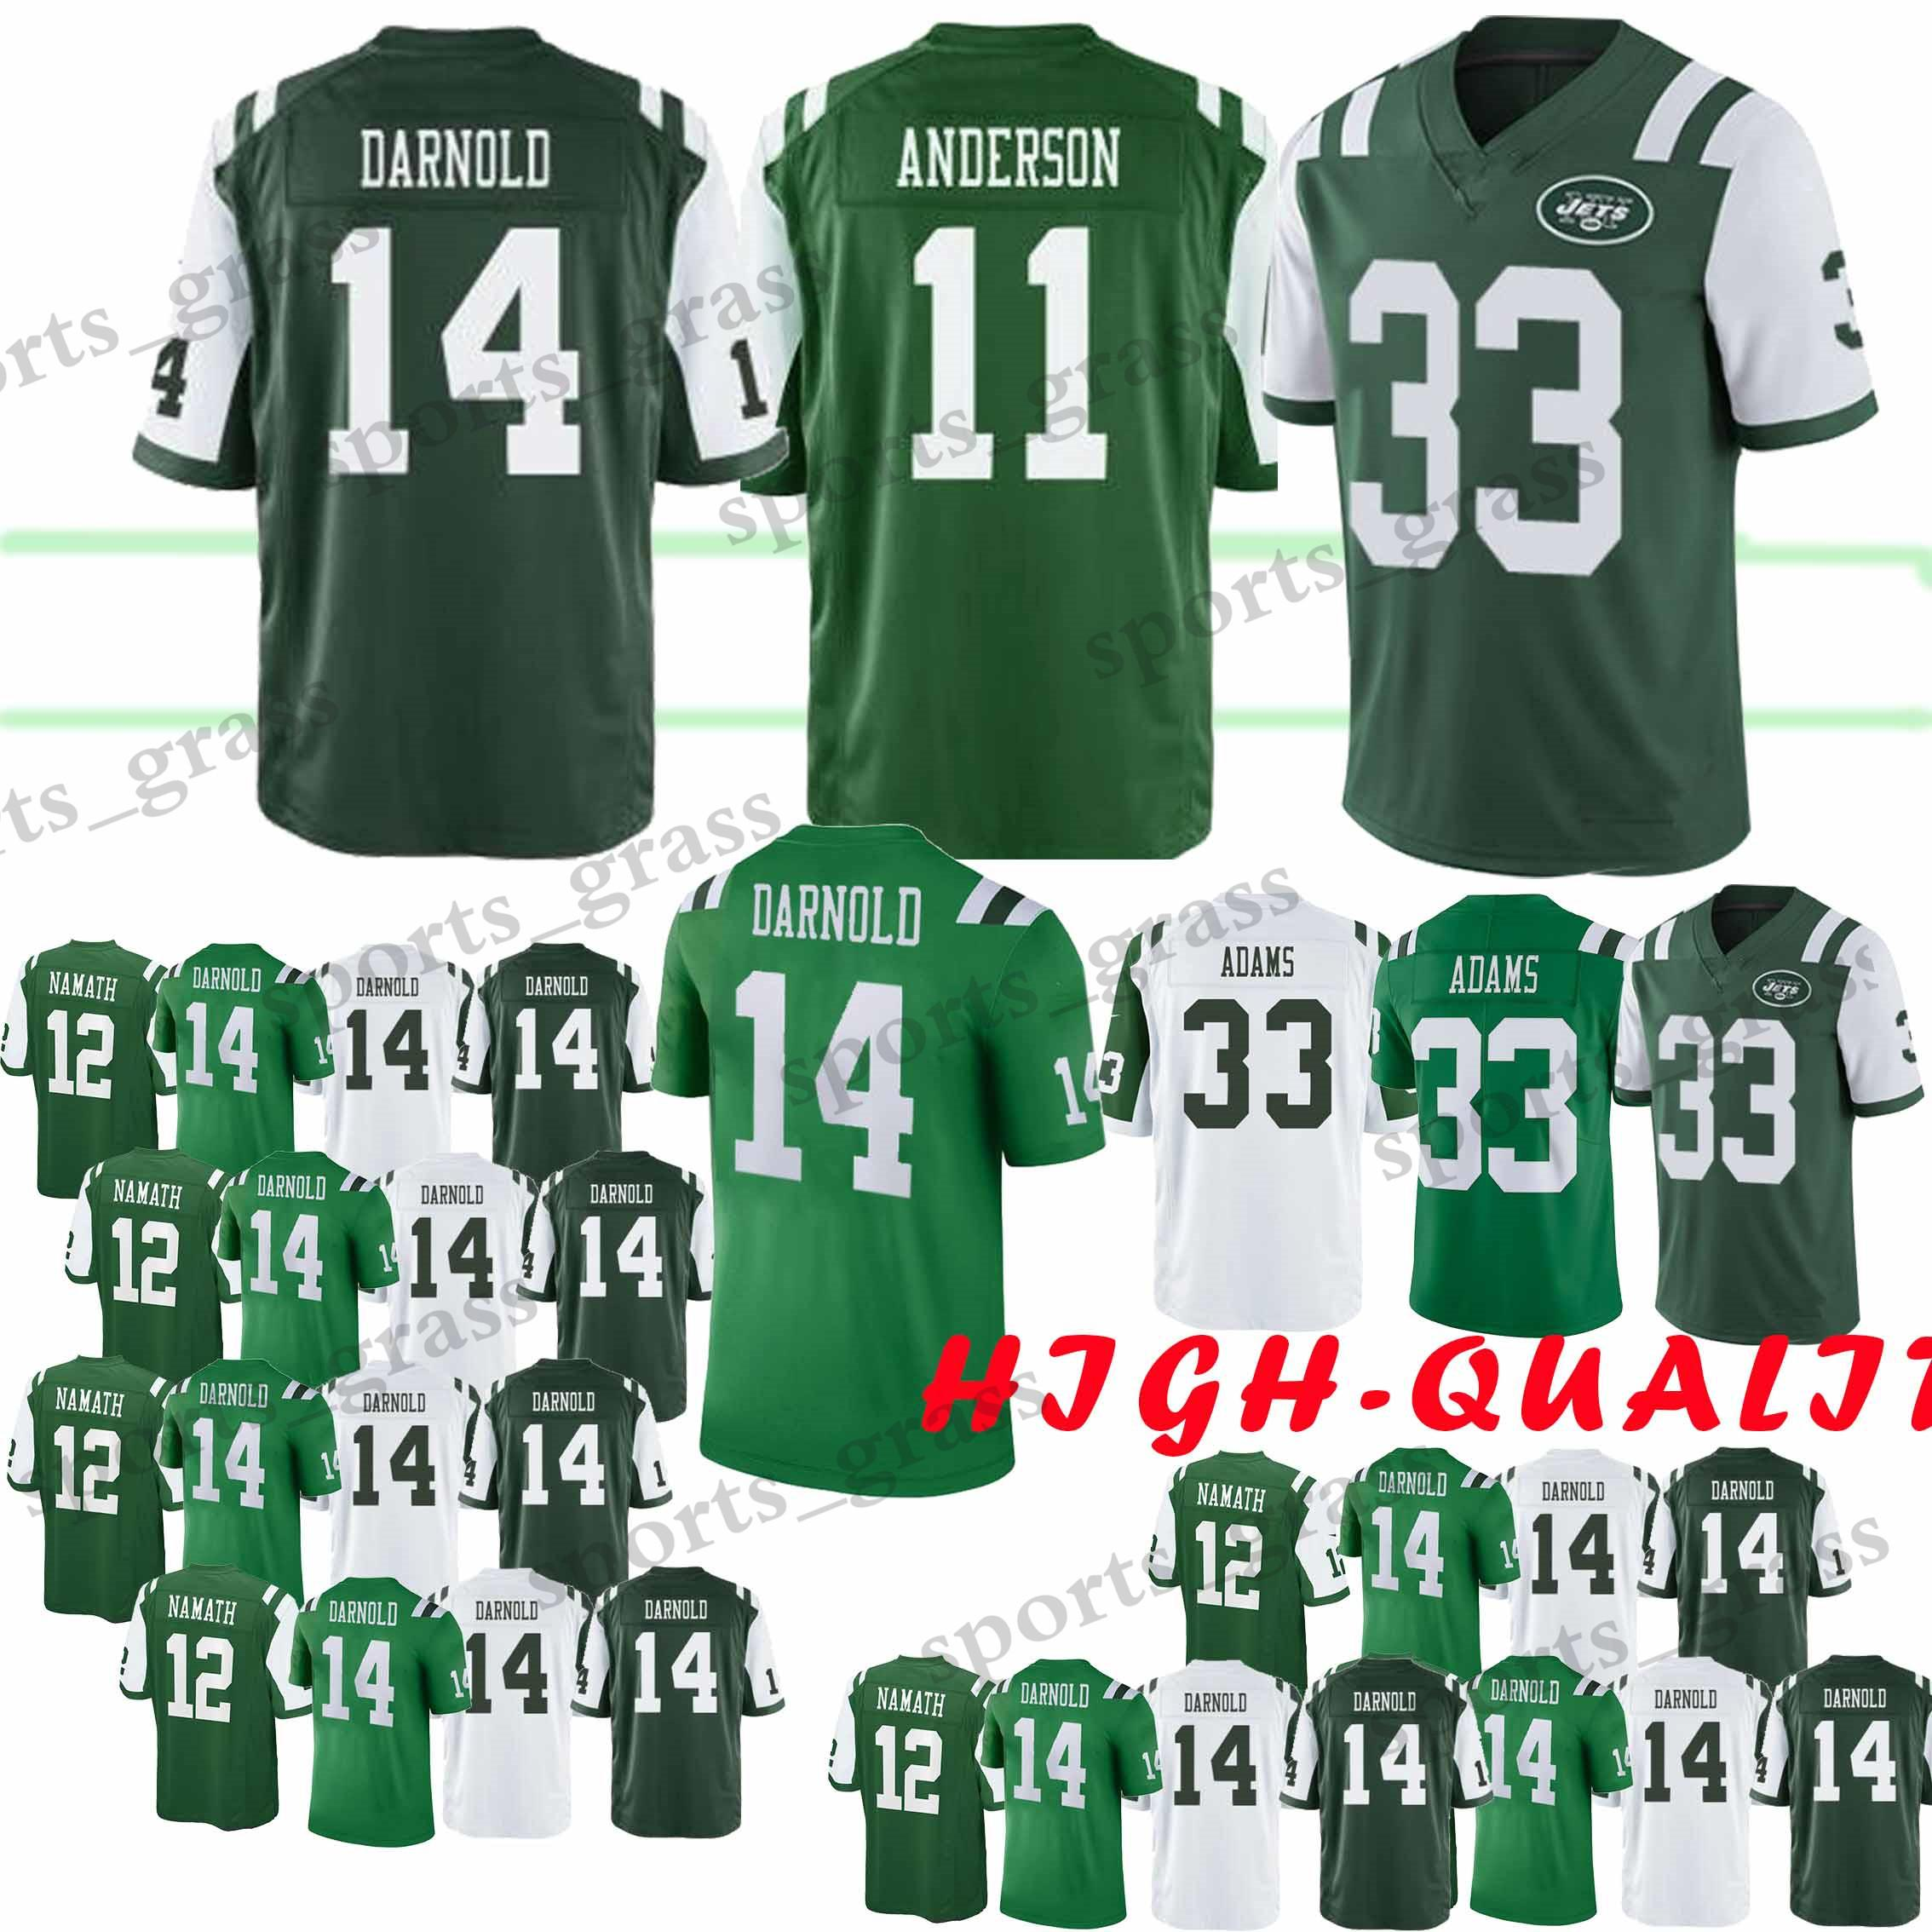 official photos eeddf d91a0 14 Sam Darnold New 11 Robby Anderson York Jets jersey 33 Jamal Adams 12 Joe  Namath jersey 2019 new Top